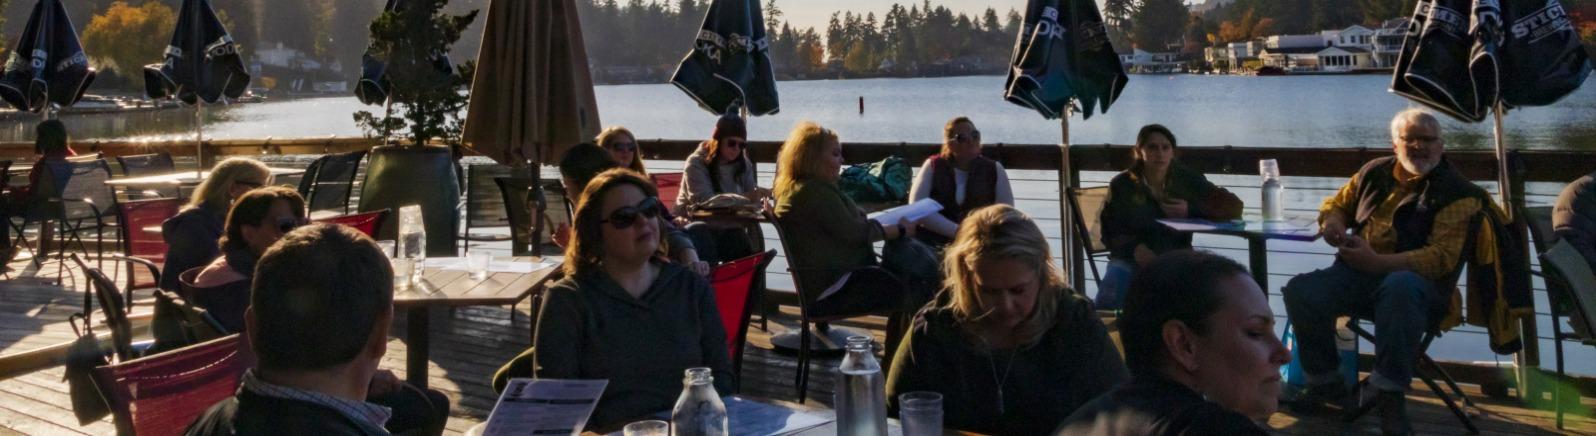 Outdoor dining at Stickmen Brewing in Lake Oswego